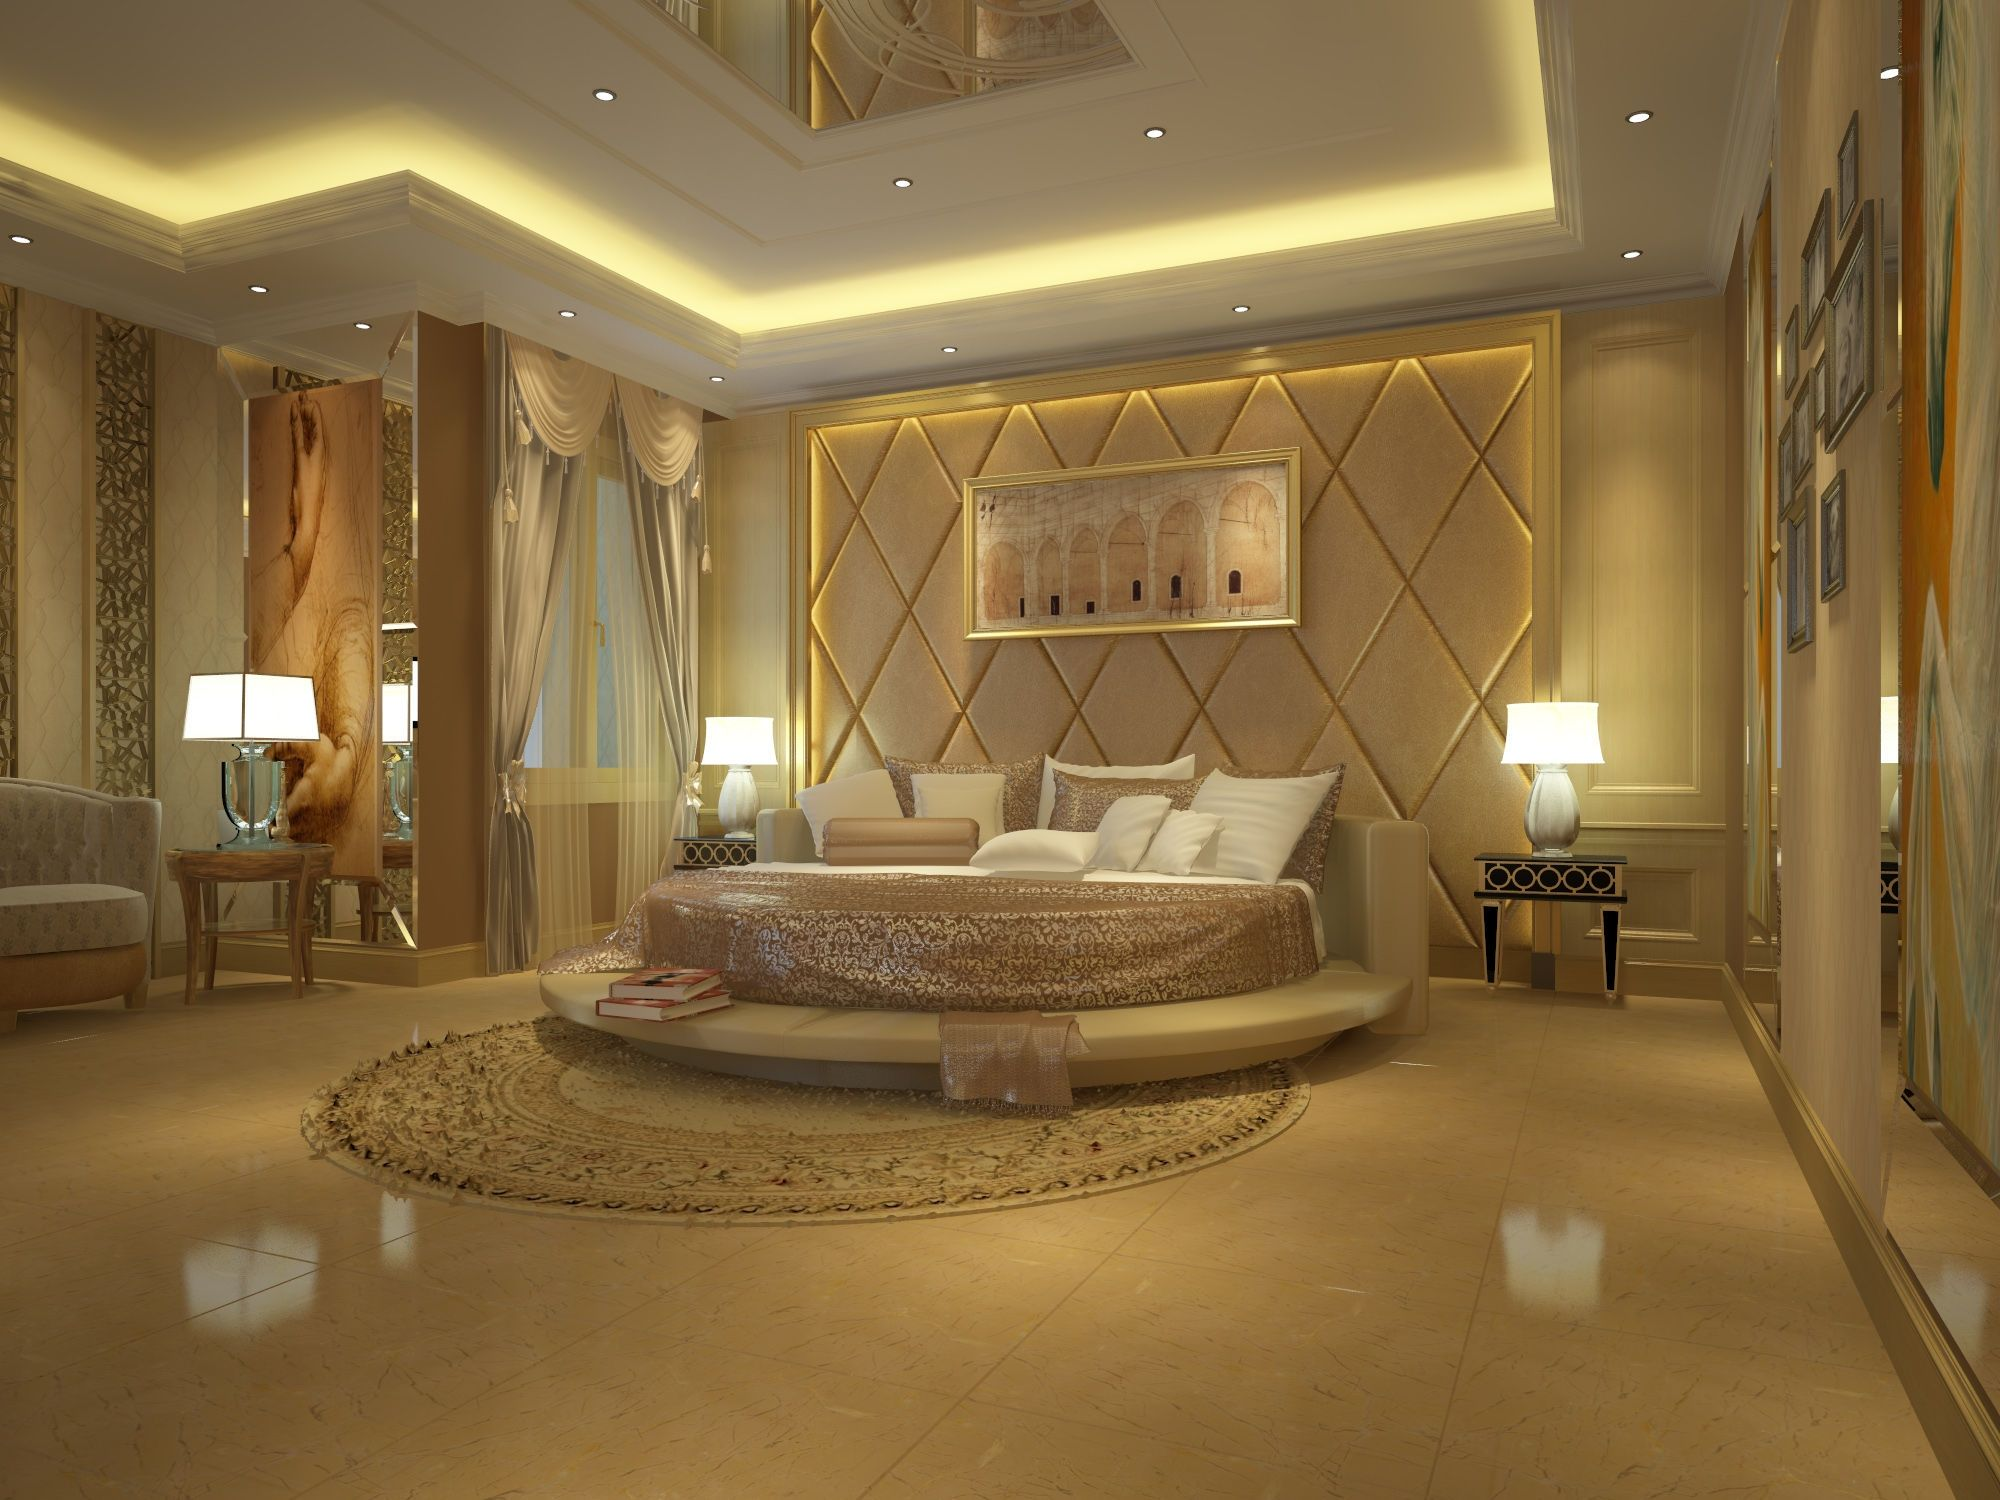 Awesome Master Bedroom Crafty Design Ideas Big Bedroom Ideas Large With Big Bedrooms Luxury Master Bedroom Design Luxurious Bedrooms Luxury Bedroom Master